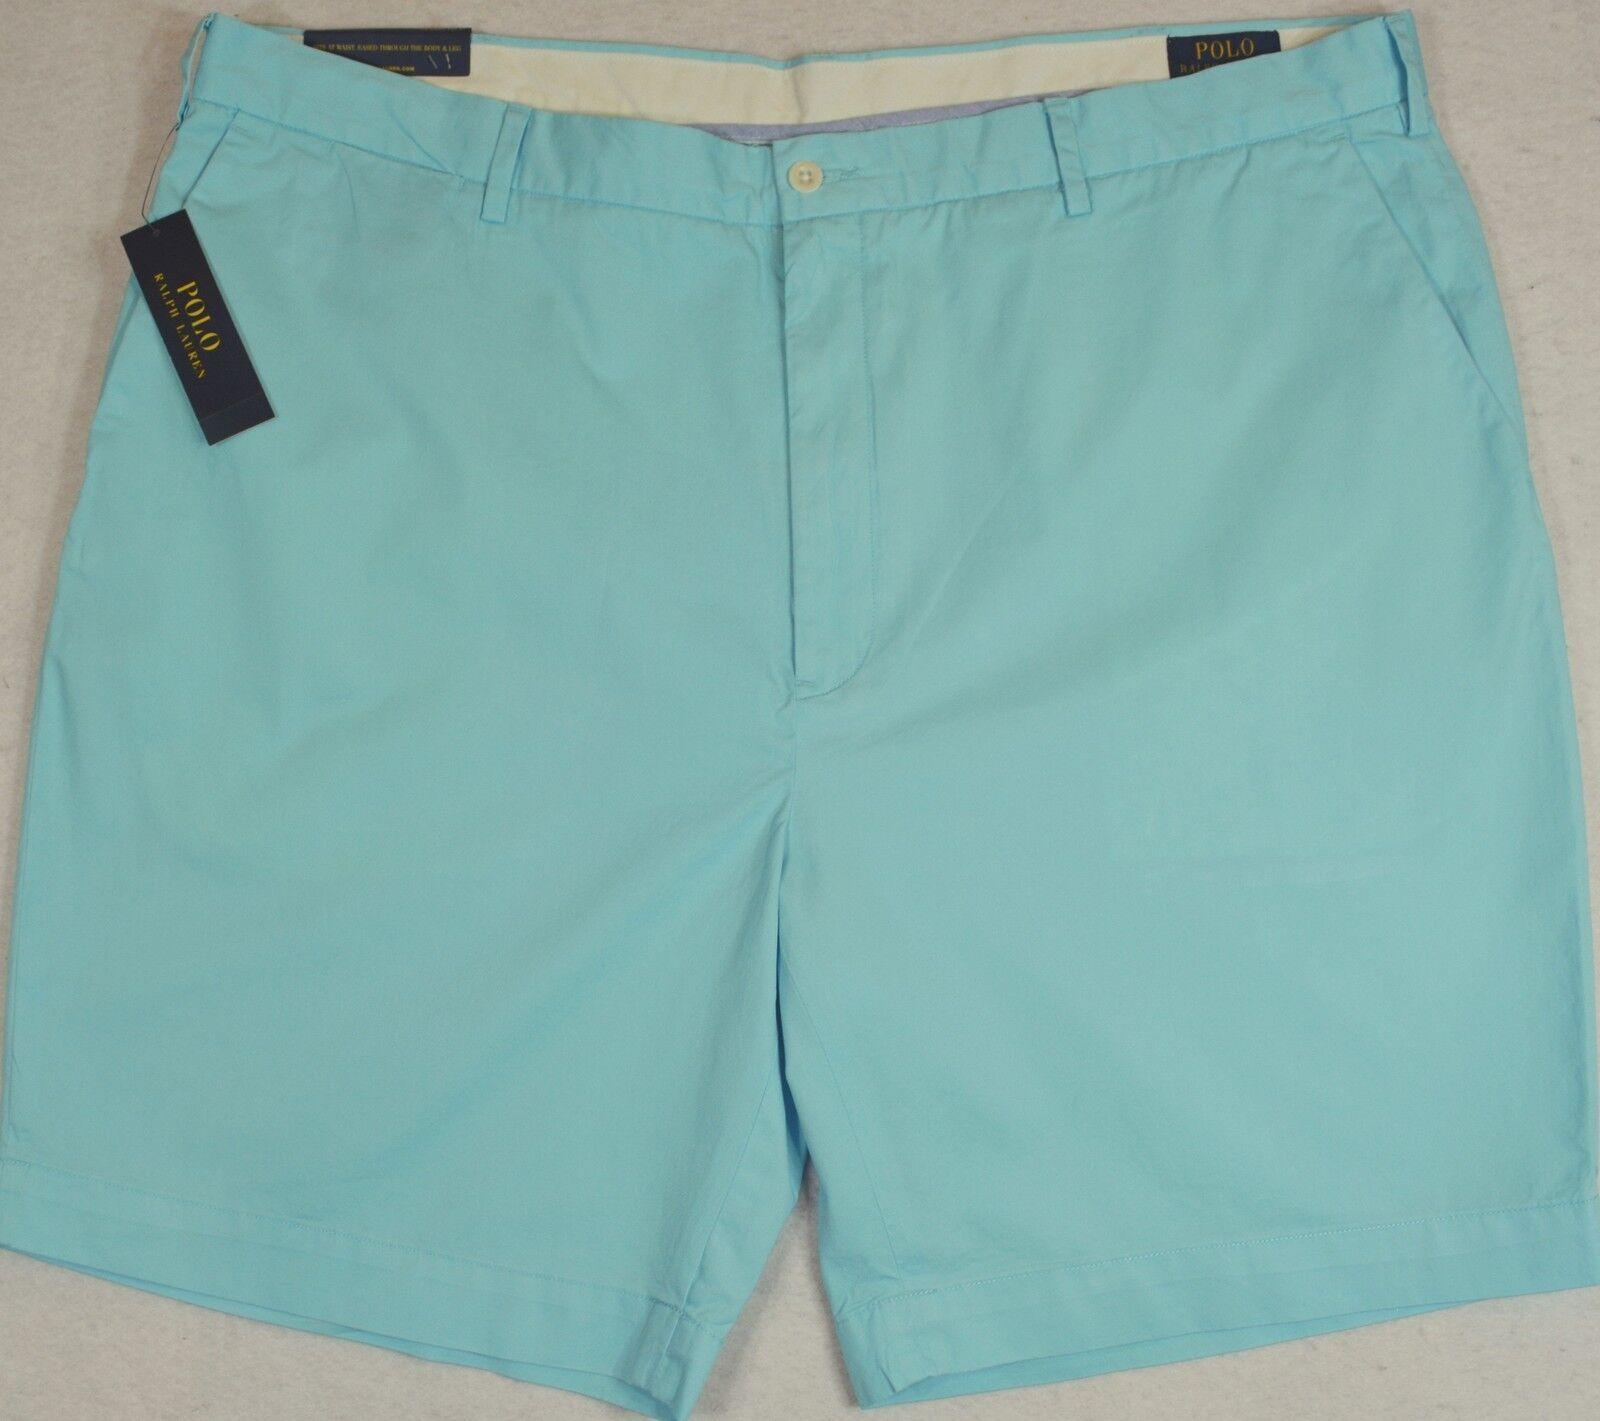 Polo Ralph Lauren Shorts Pima Blend Hammond bluee Classic Fit 9  50 & 52 NWT